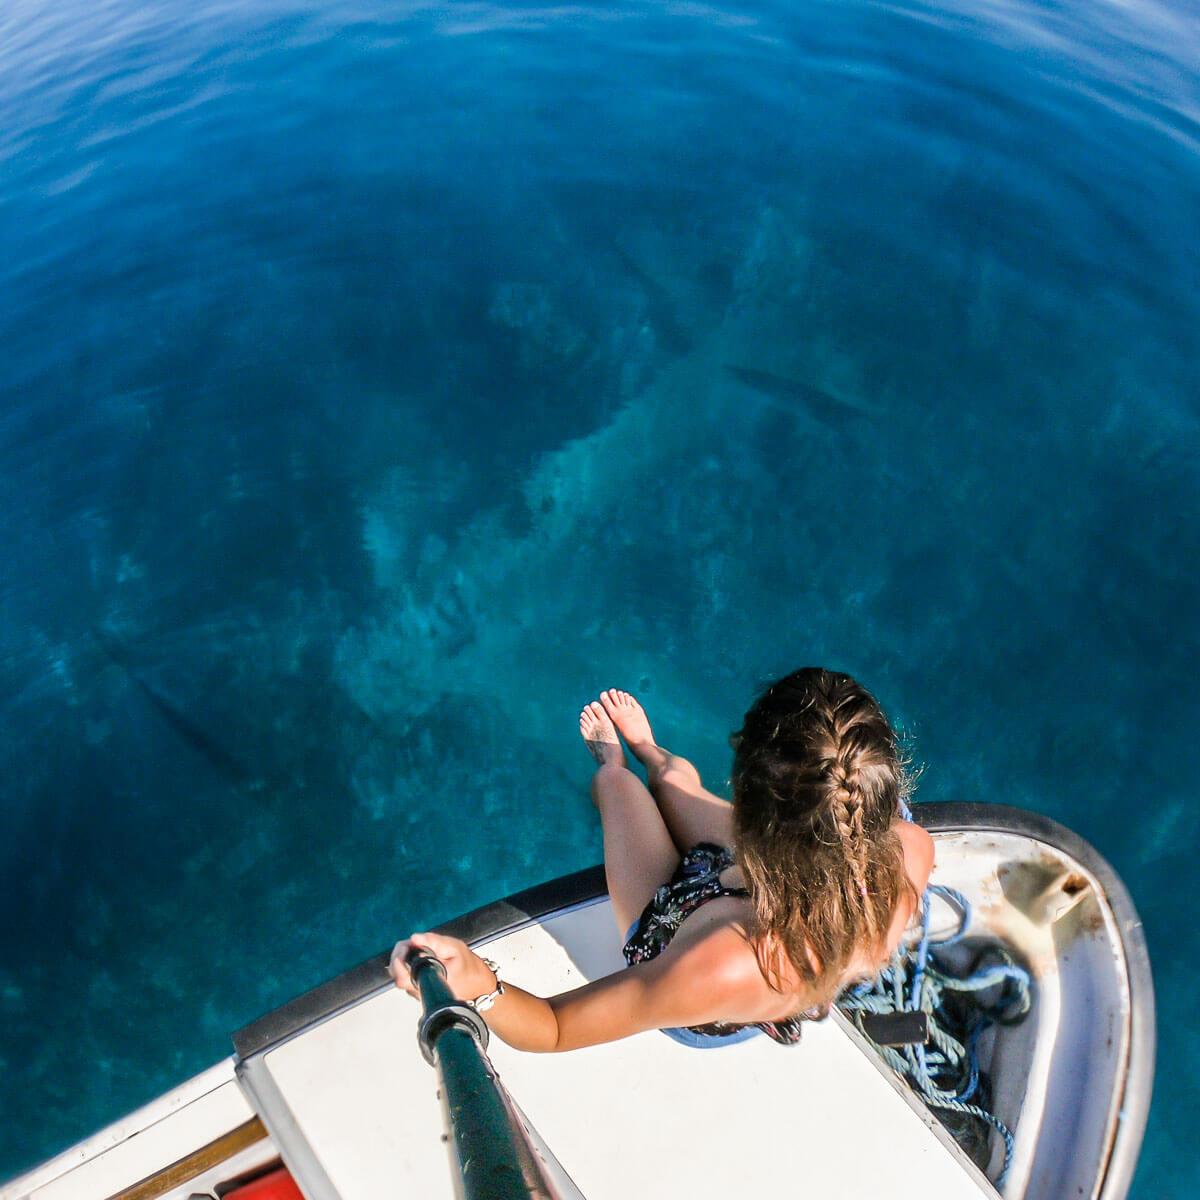 solomon islands WW2 plane wreck dive site go pro